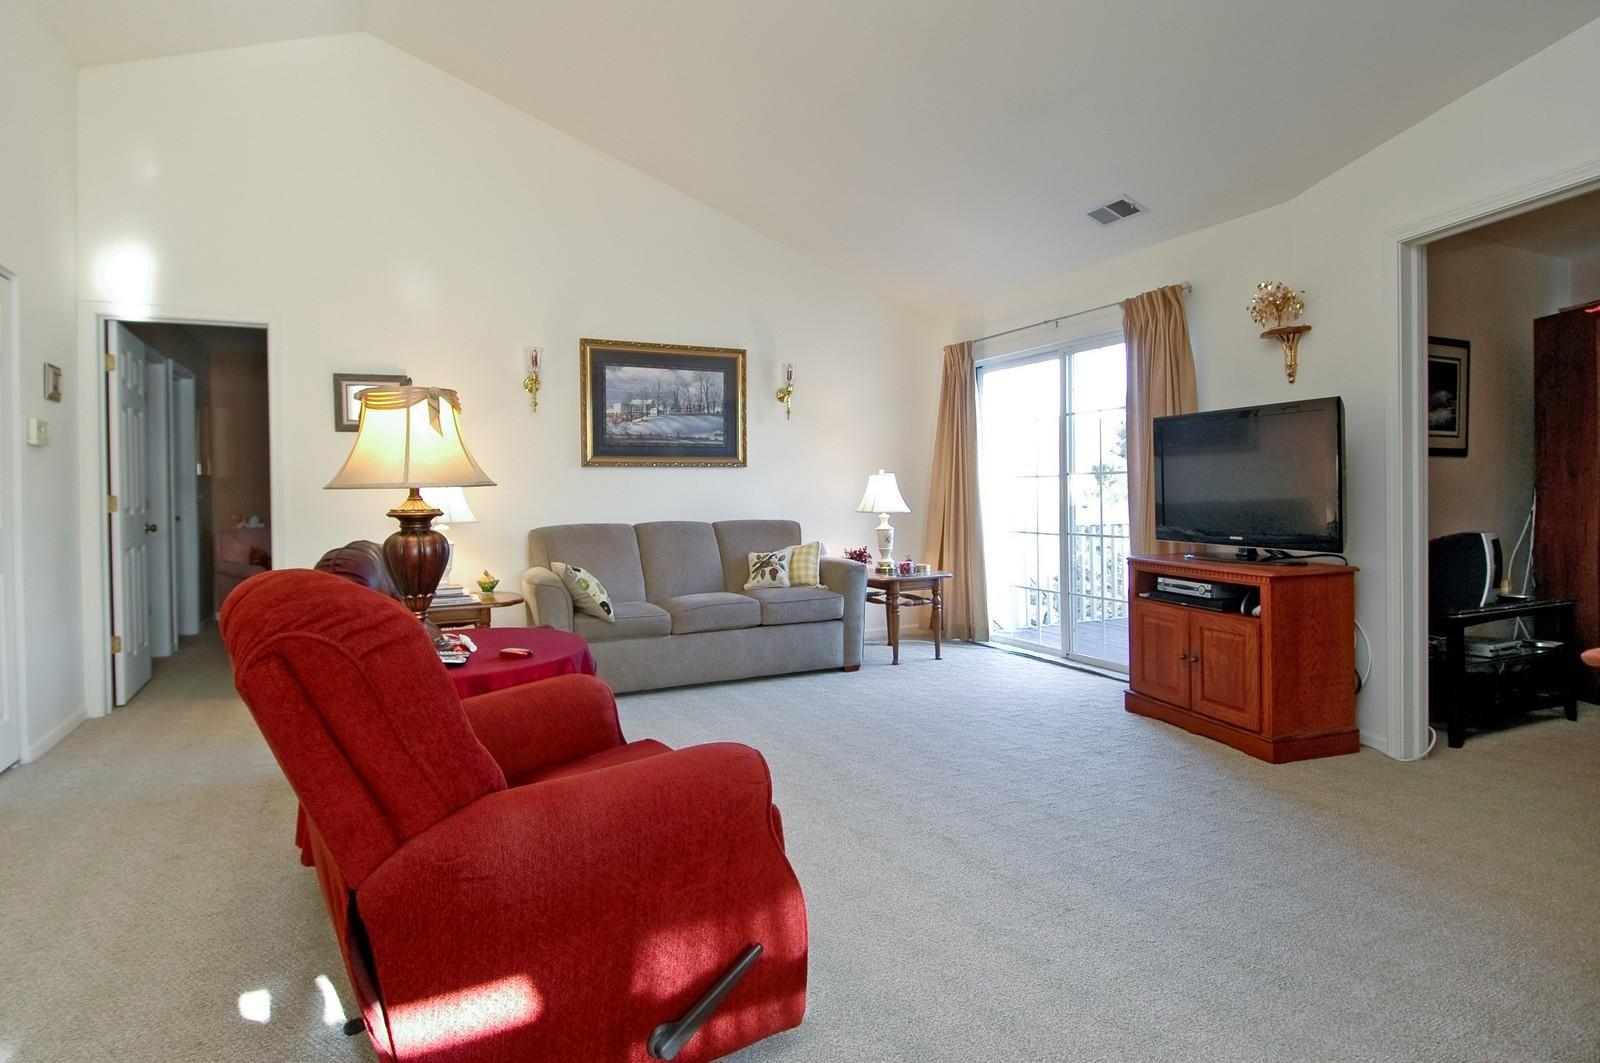 Real Estate Photography - 346 Crystal Ridge, Crystal Lake, IL, 60014 - Living Room